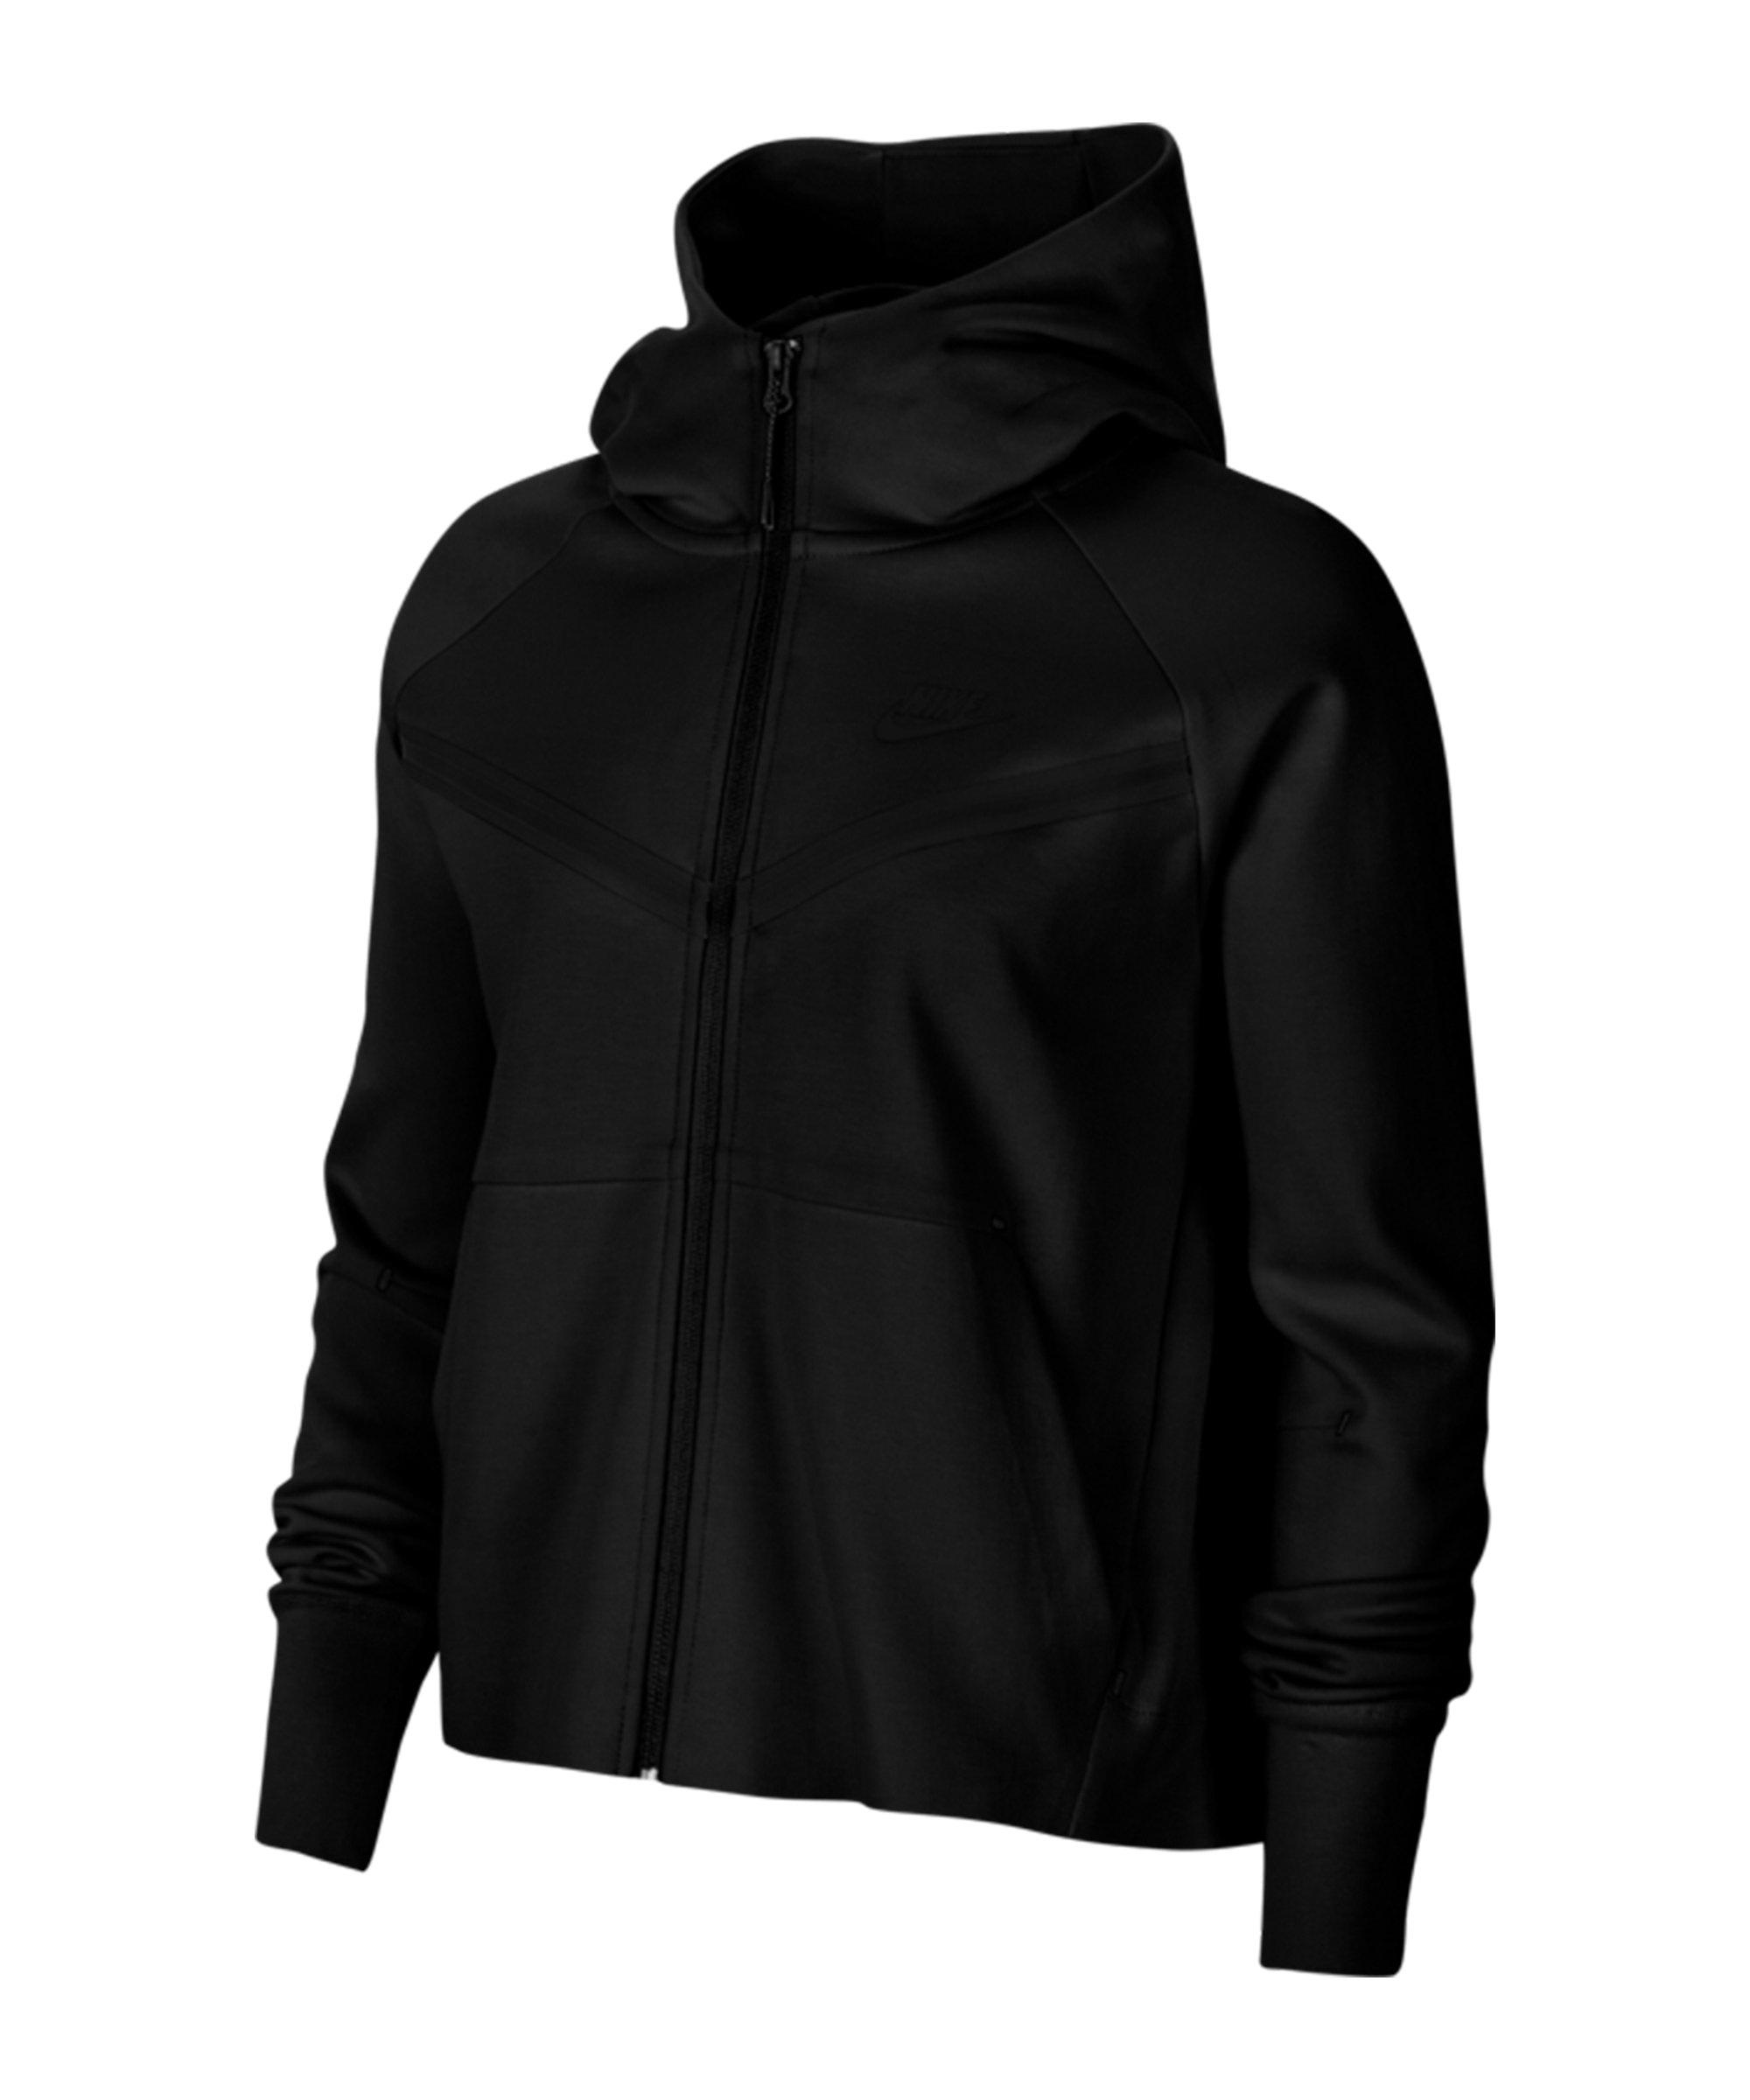 Nike Tech Fleece Windrunner Damen Schwarz F010 - schwarz